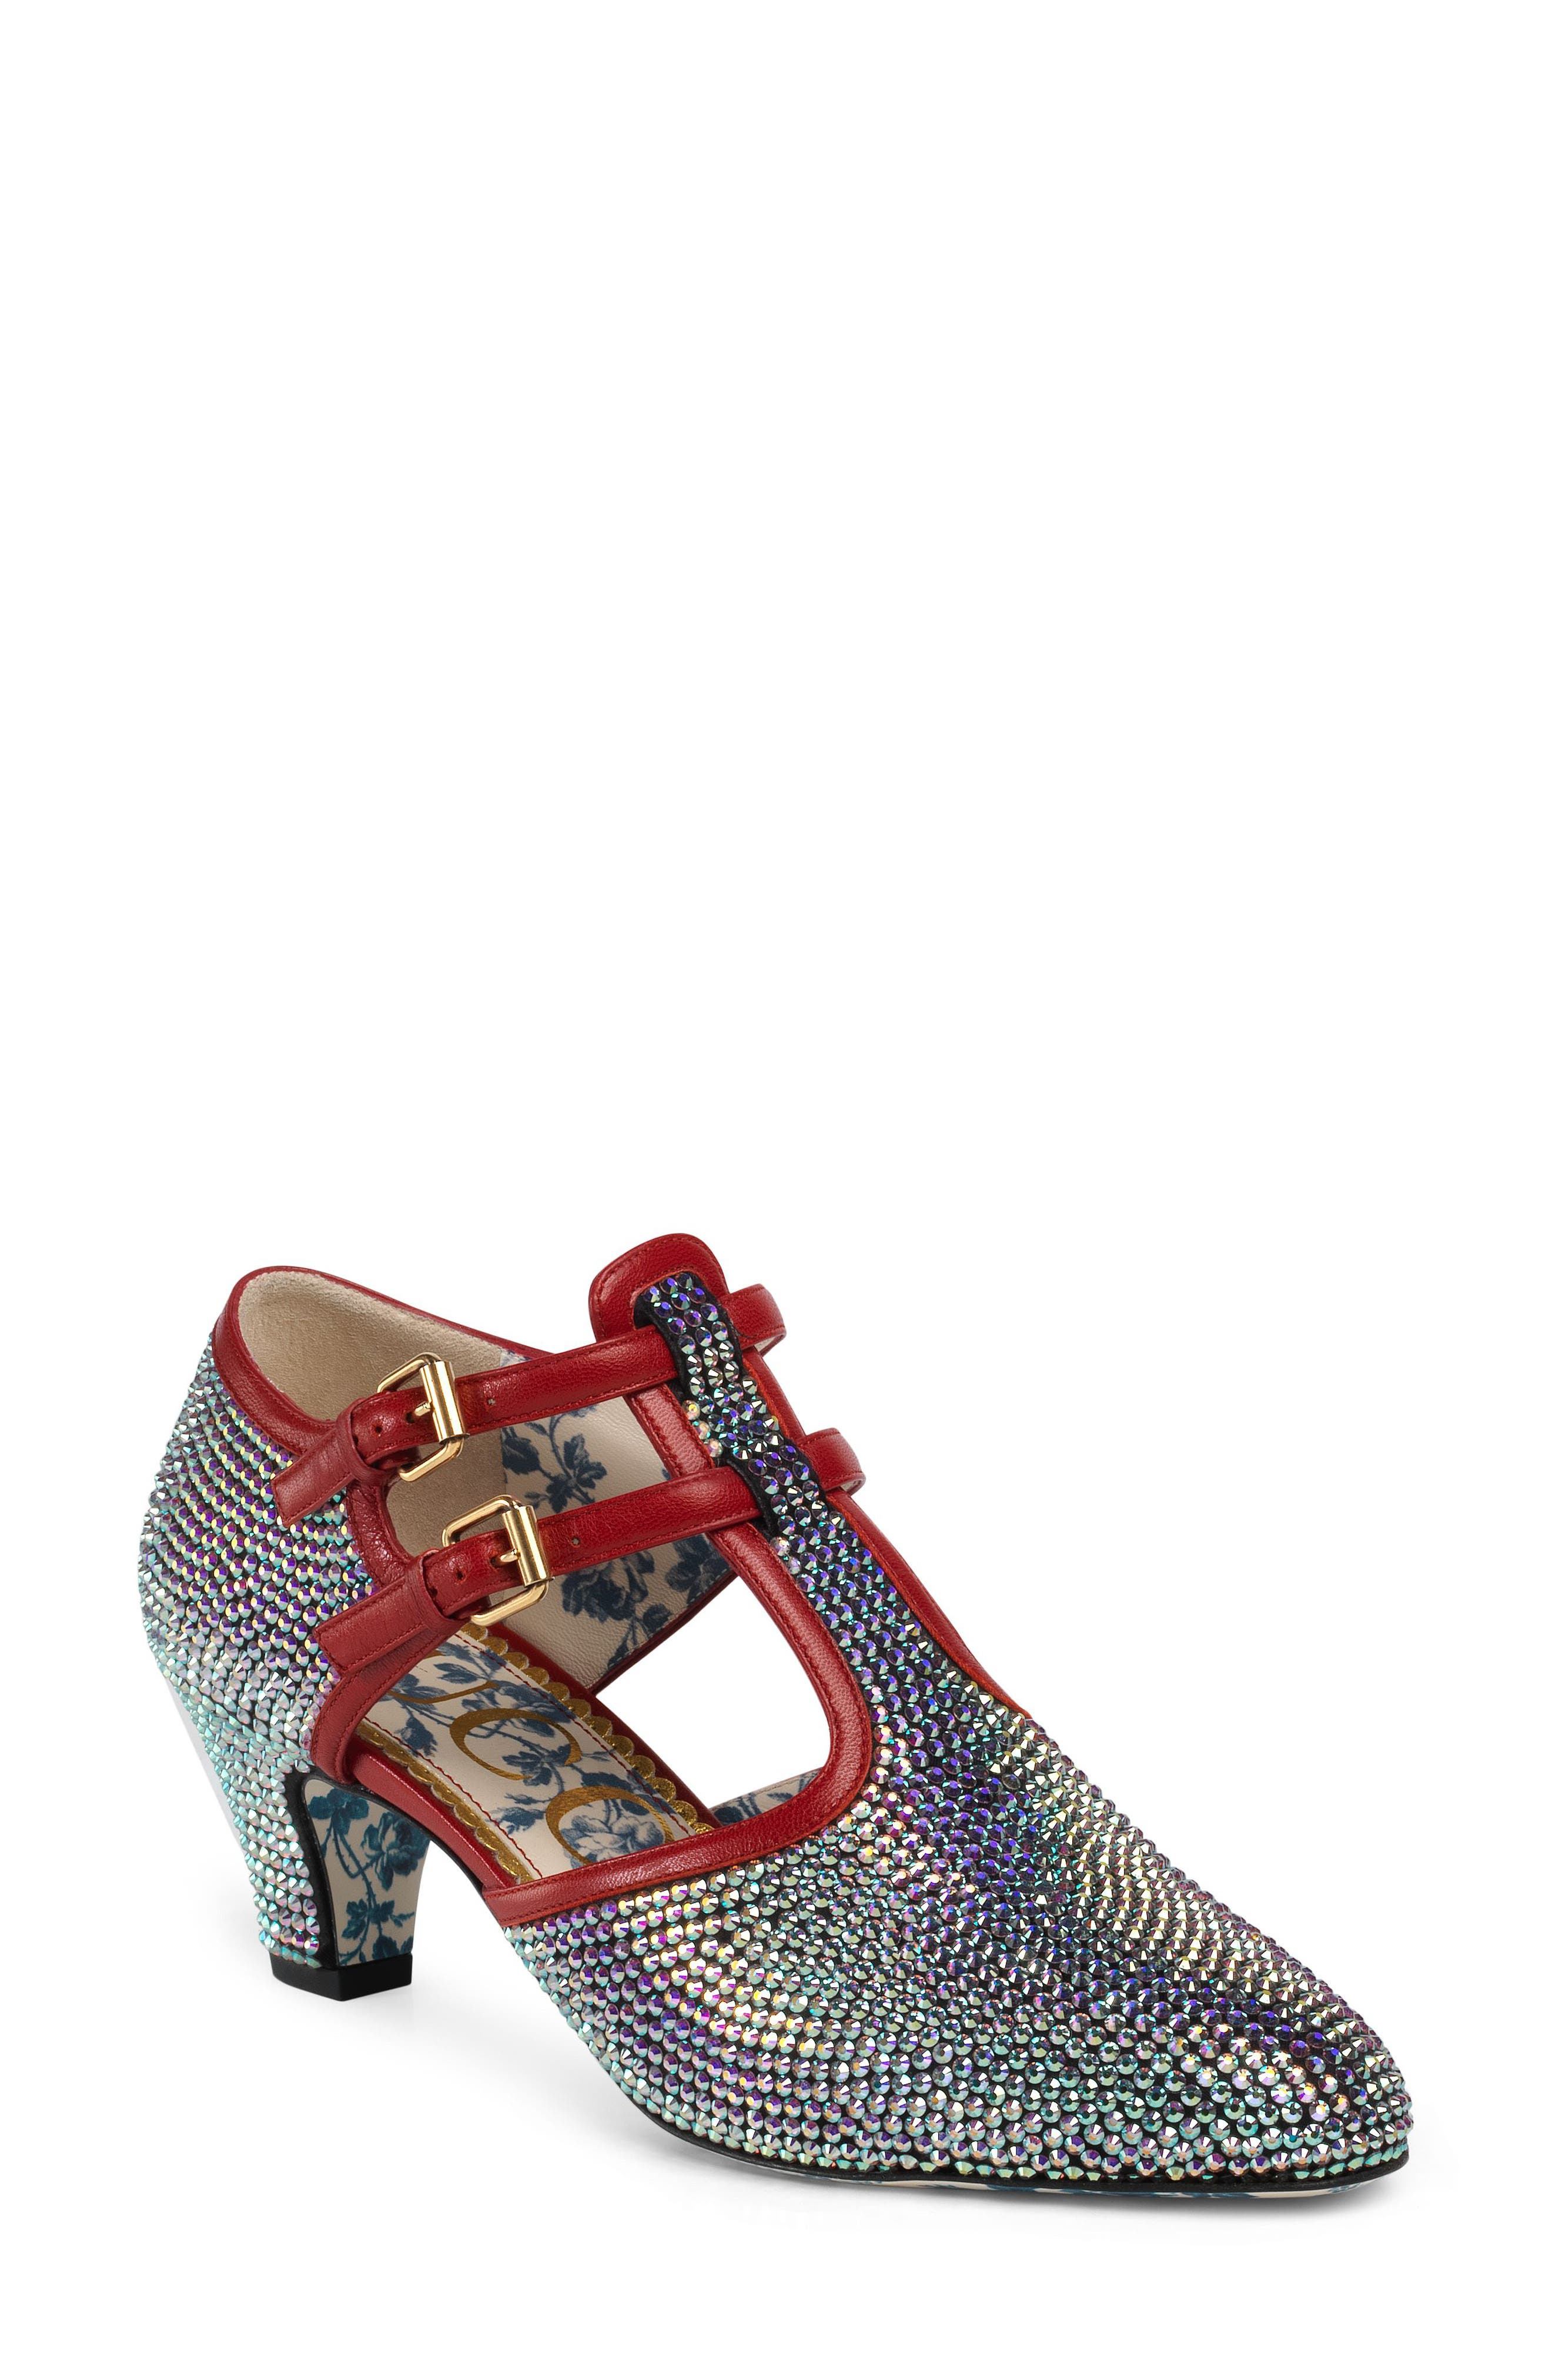 ee5de9c12118 Gucci Women s Mila Crystal Embellished Satin T-Strap Pumps In ...